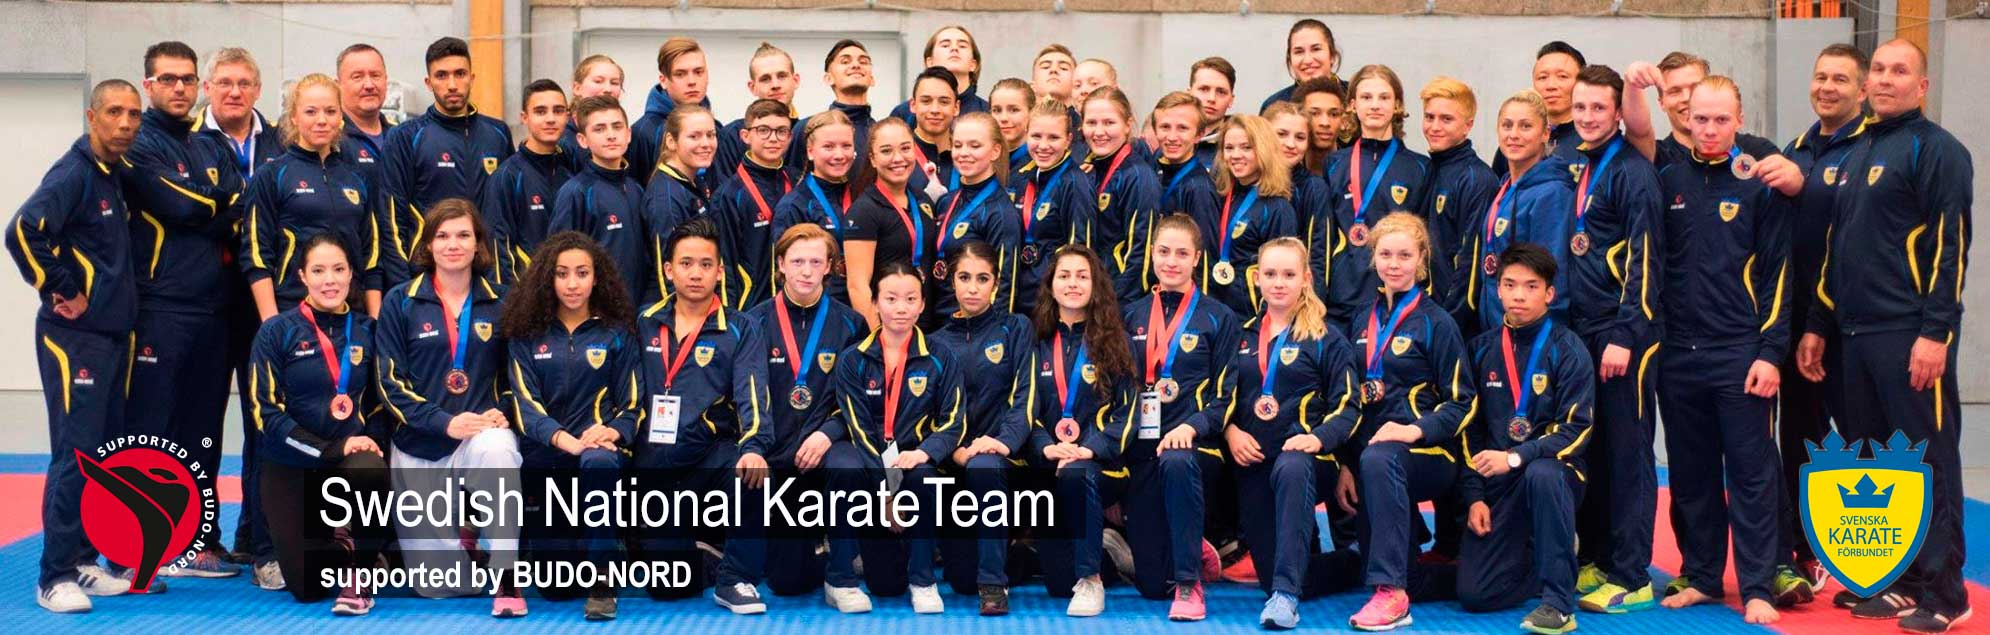 Swedish National Karate Team